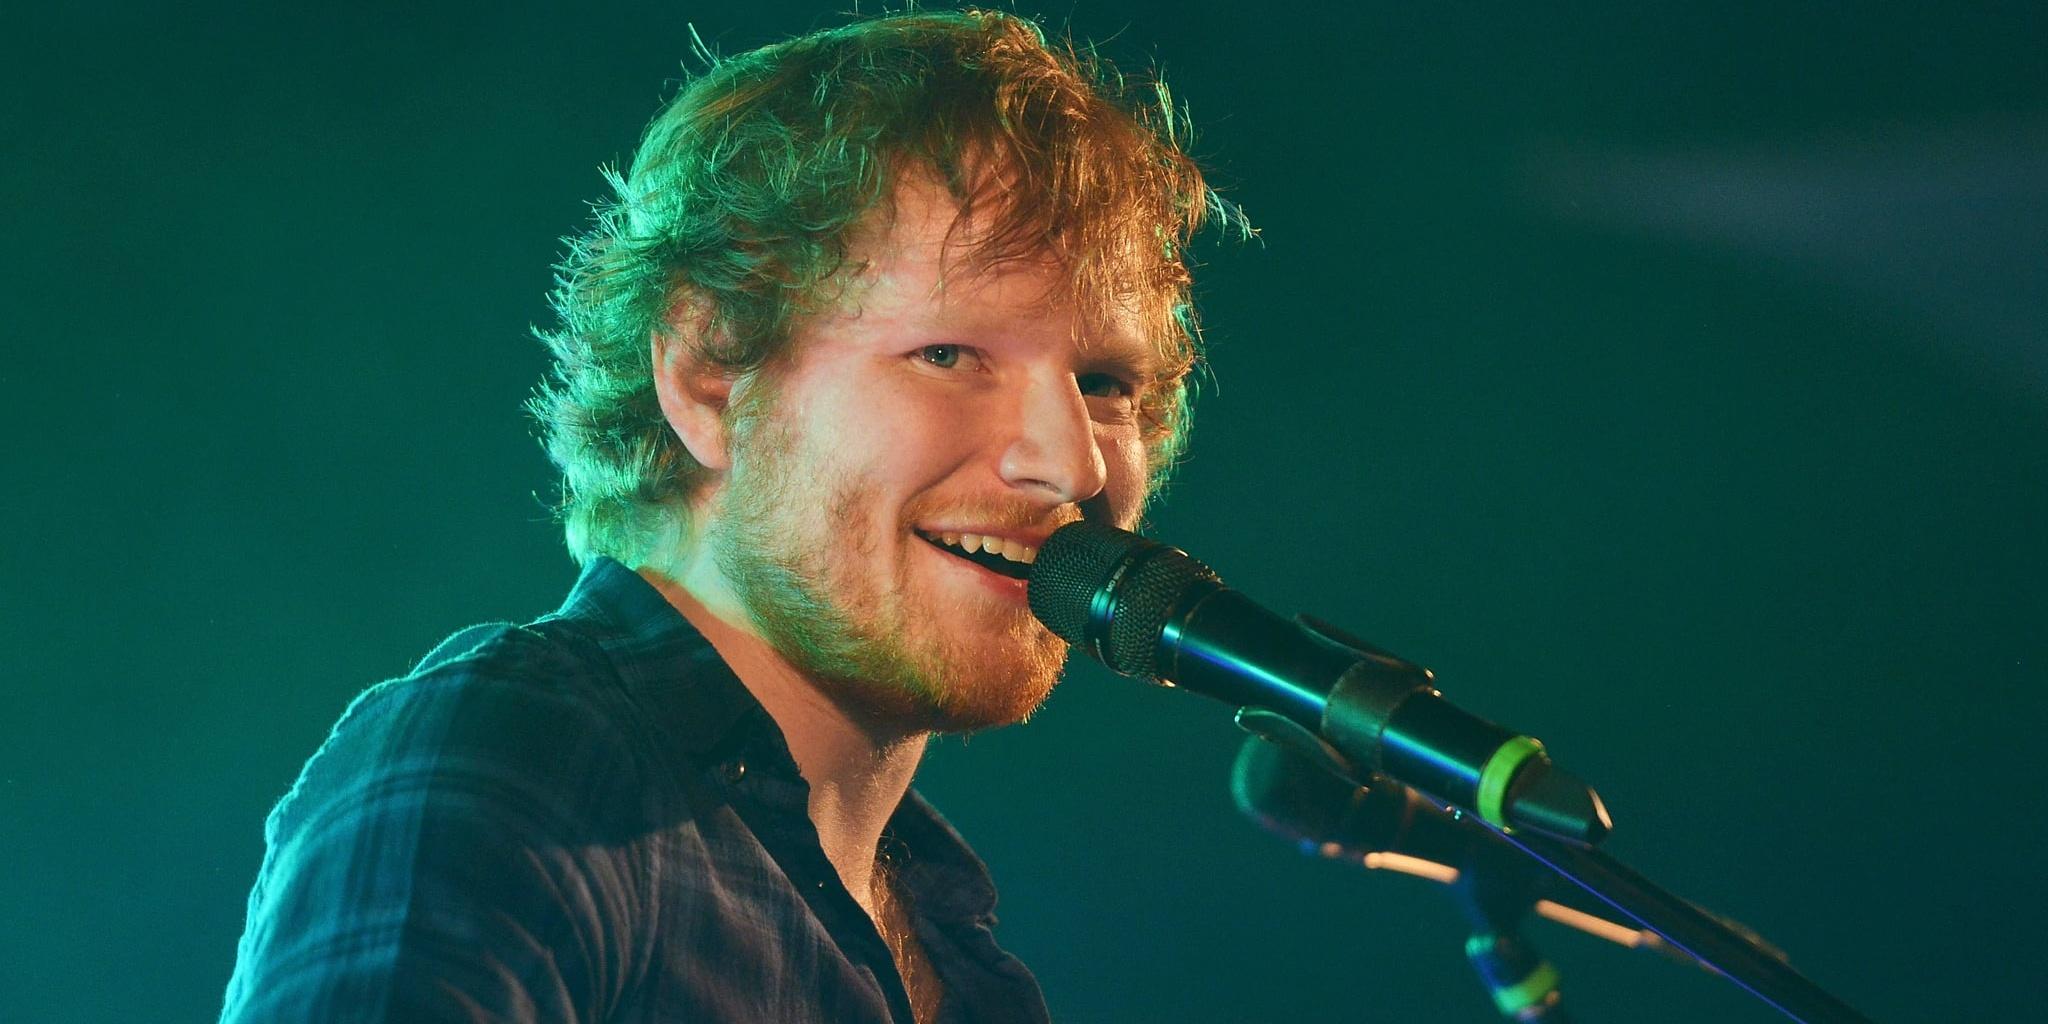 Ed Sheeran announces 18-month hiatus from touring